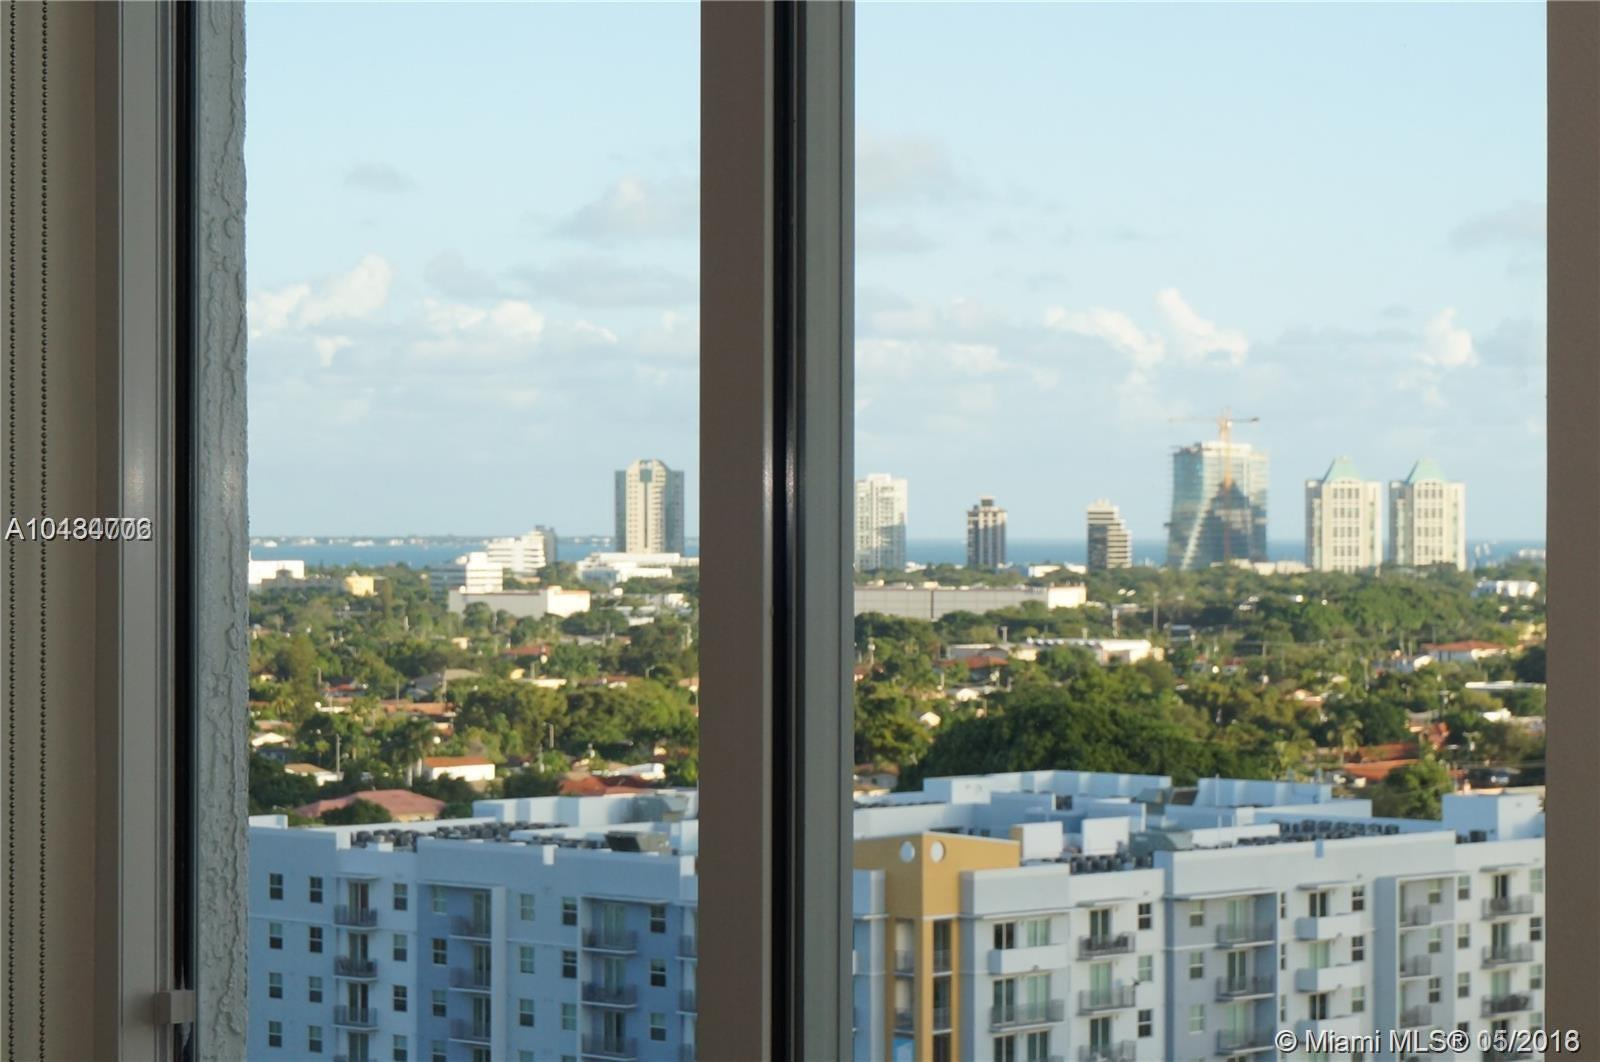 10 Aragon Ave #1519 - 1520, Coral Gables FL, 33134